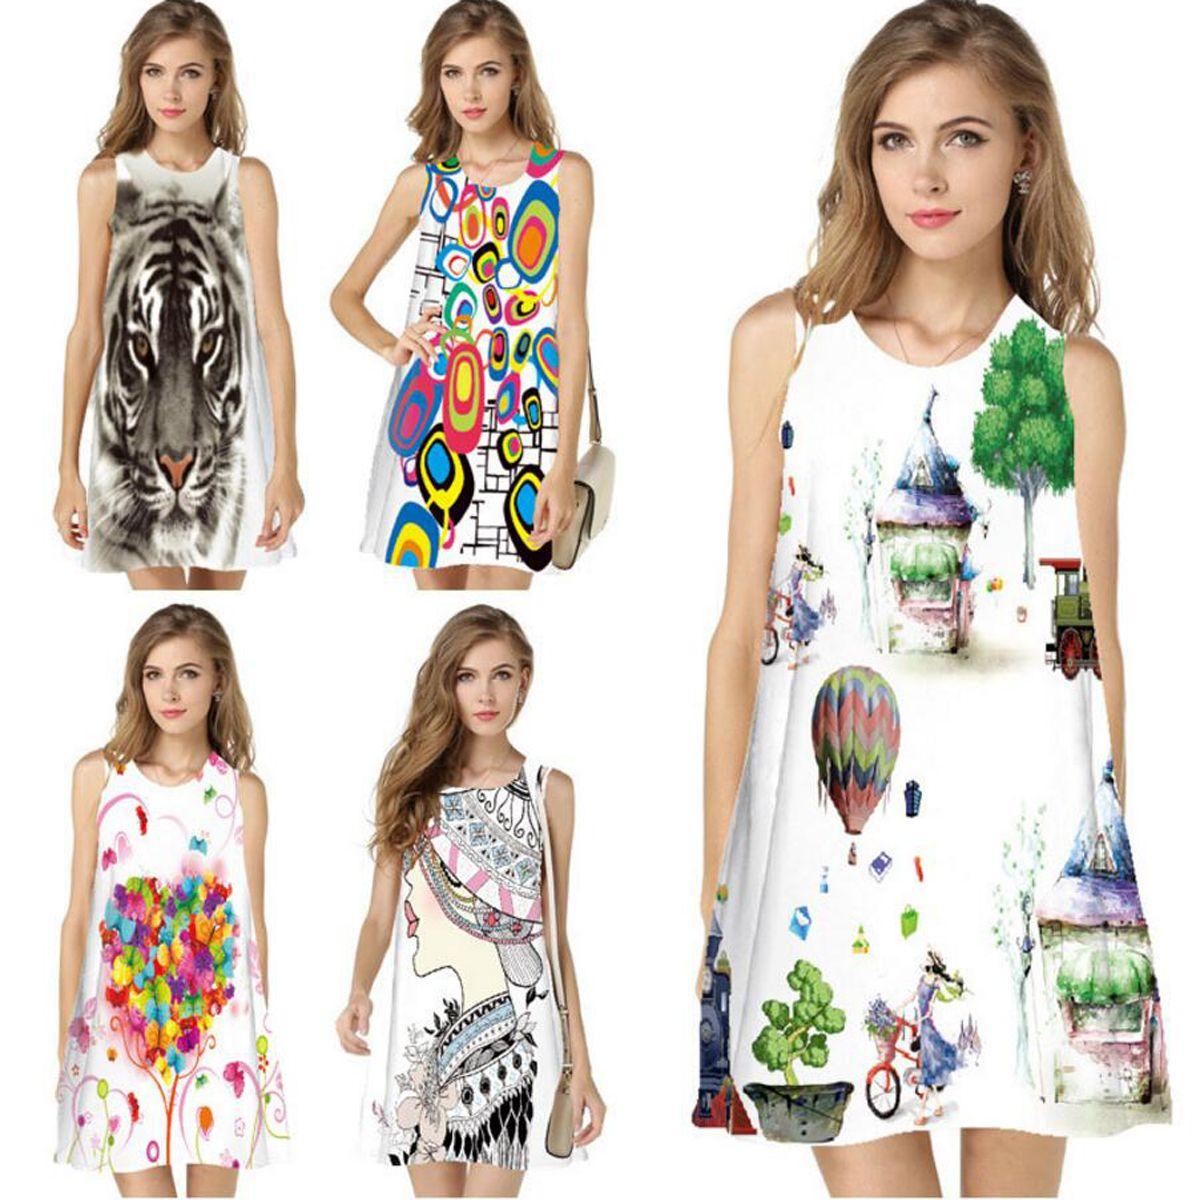 0786b2aa68 Women Dresses Digital Print Dress Summer New Fashion Boho Style Beach Dress  Sleveless Round Neck Mini Vestidos Shirt Dresses Fashion Dress From  Zclgarments, ...